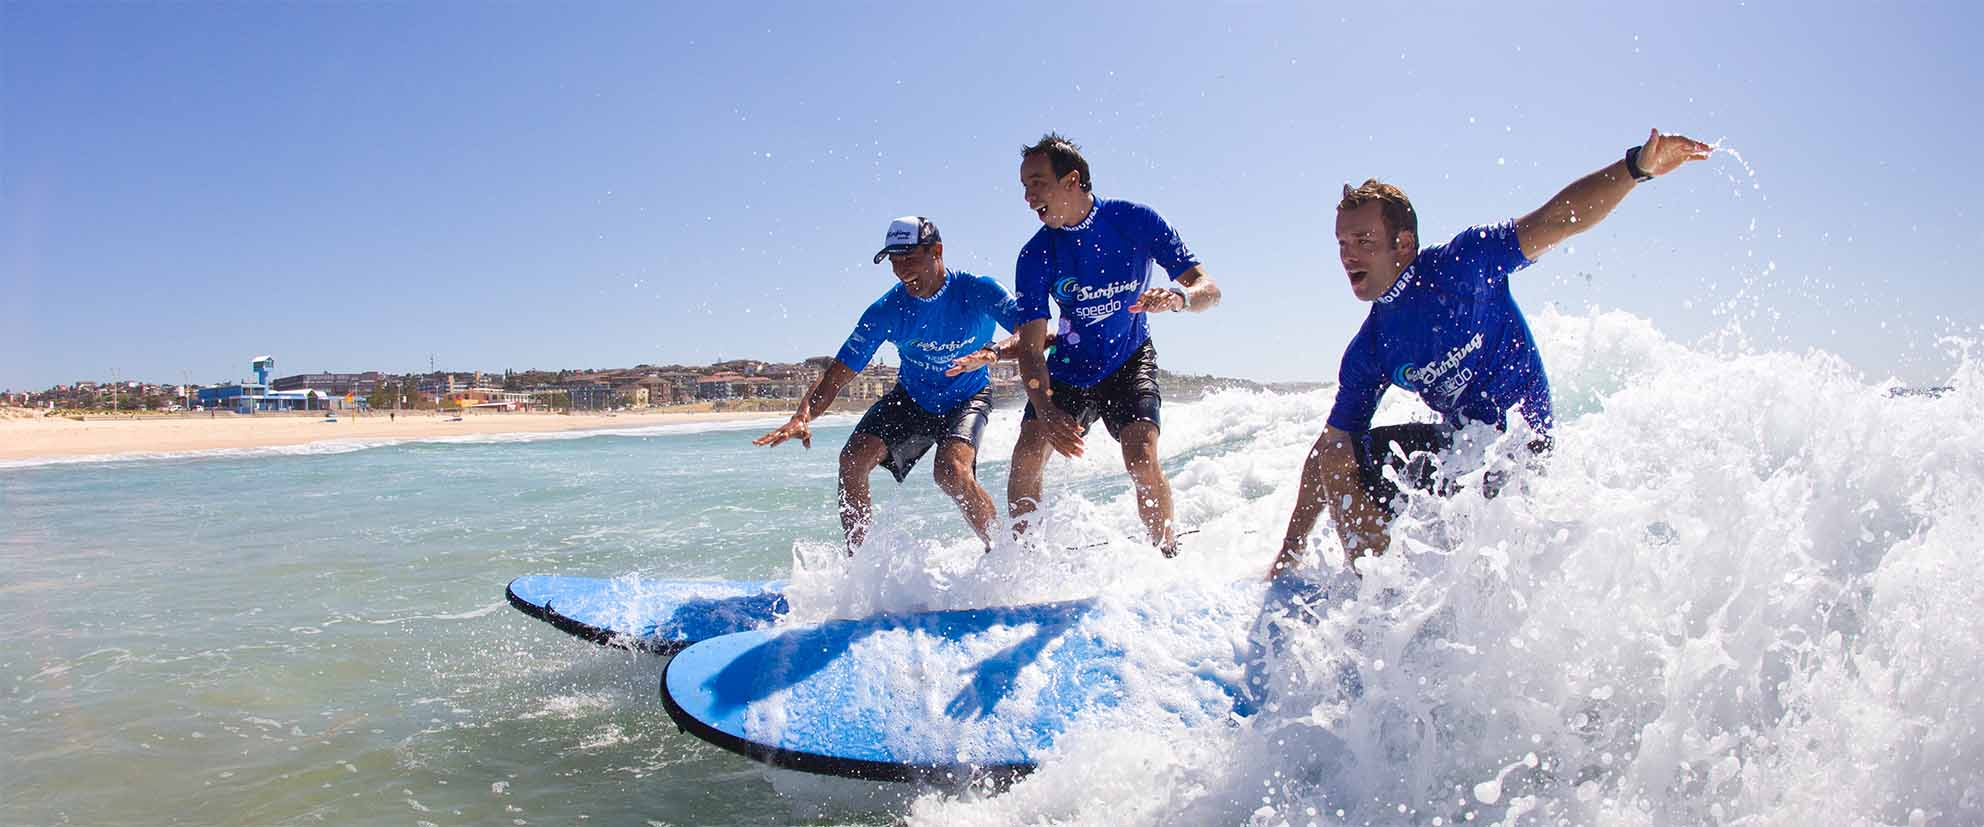 Maroubra Beach Surf Shop Surfing at Maroubra Beach